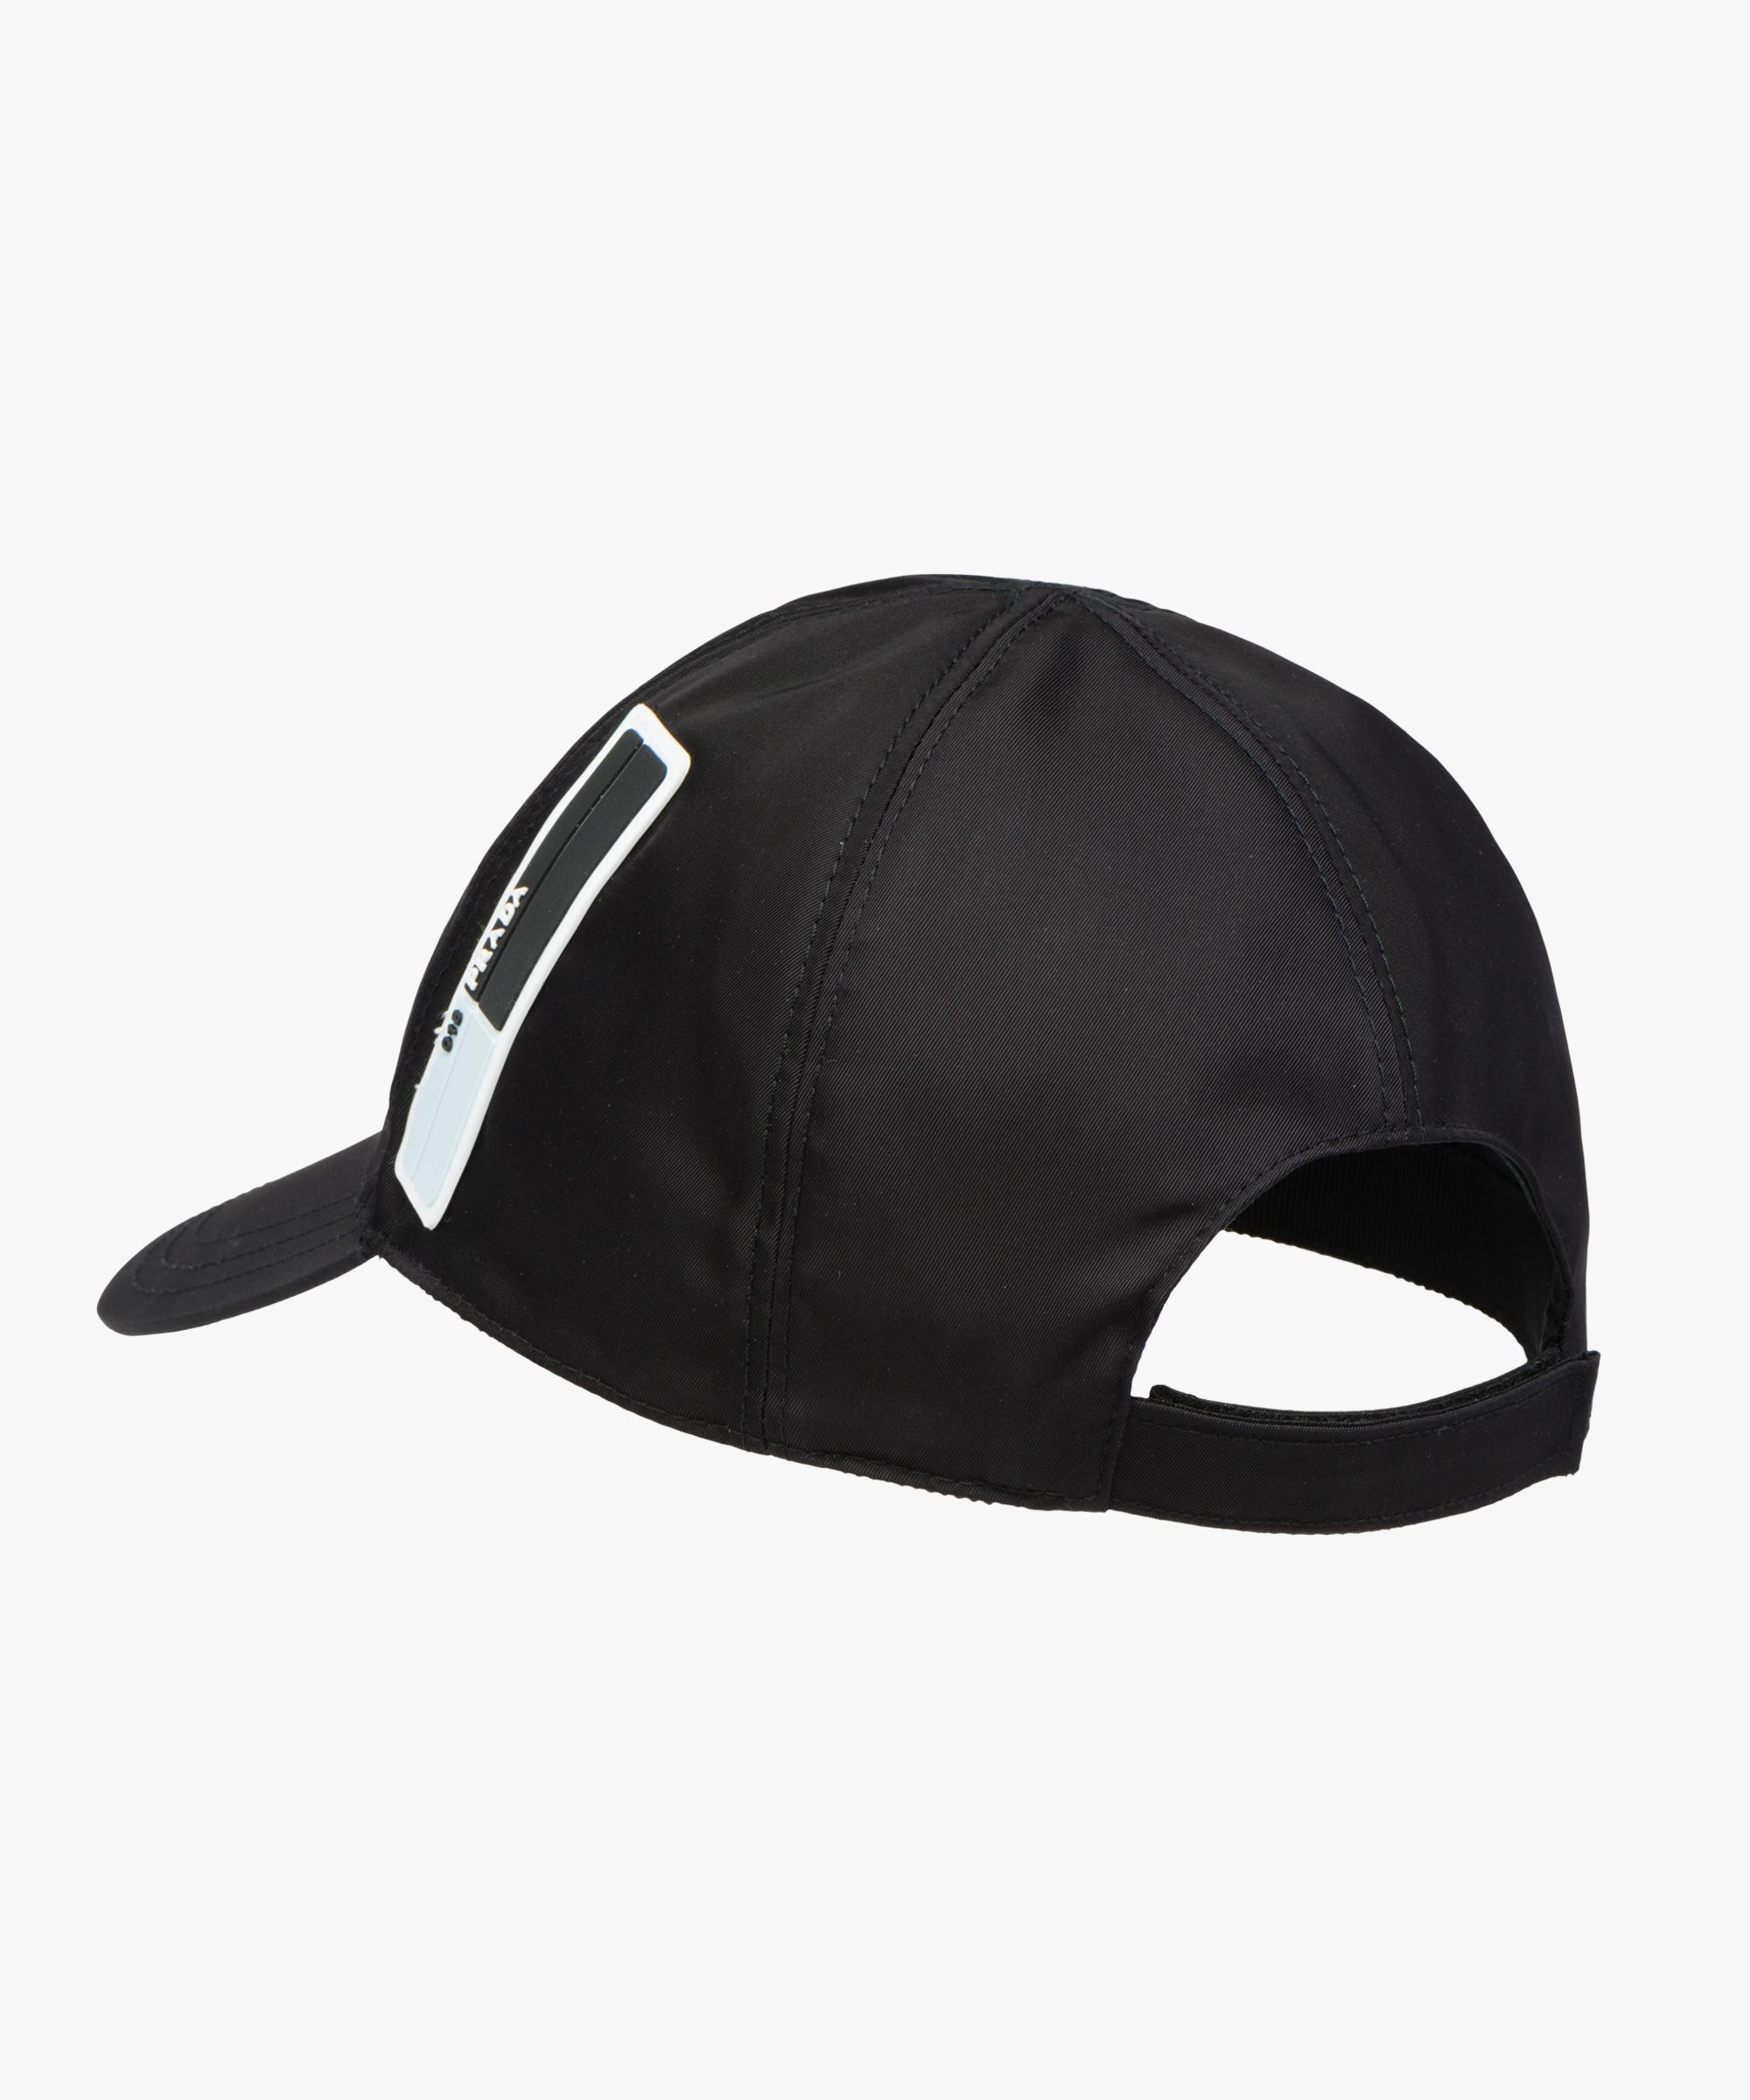 d019c42a7 ... Nylon baseball cap Prada BLACK ...